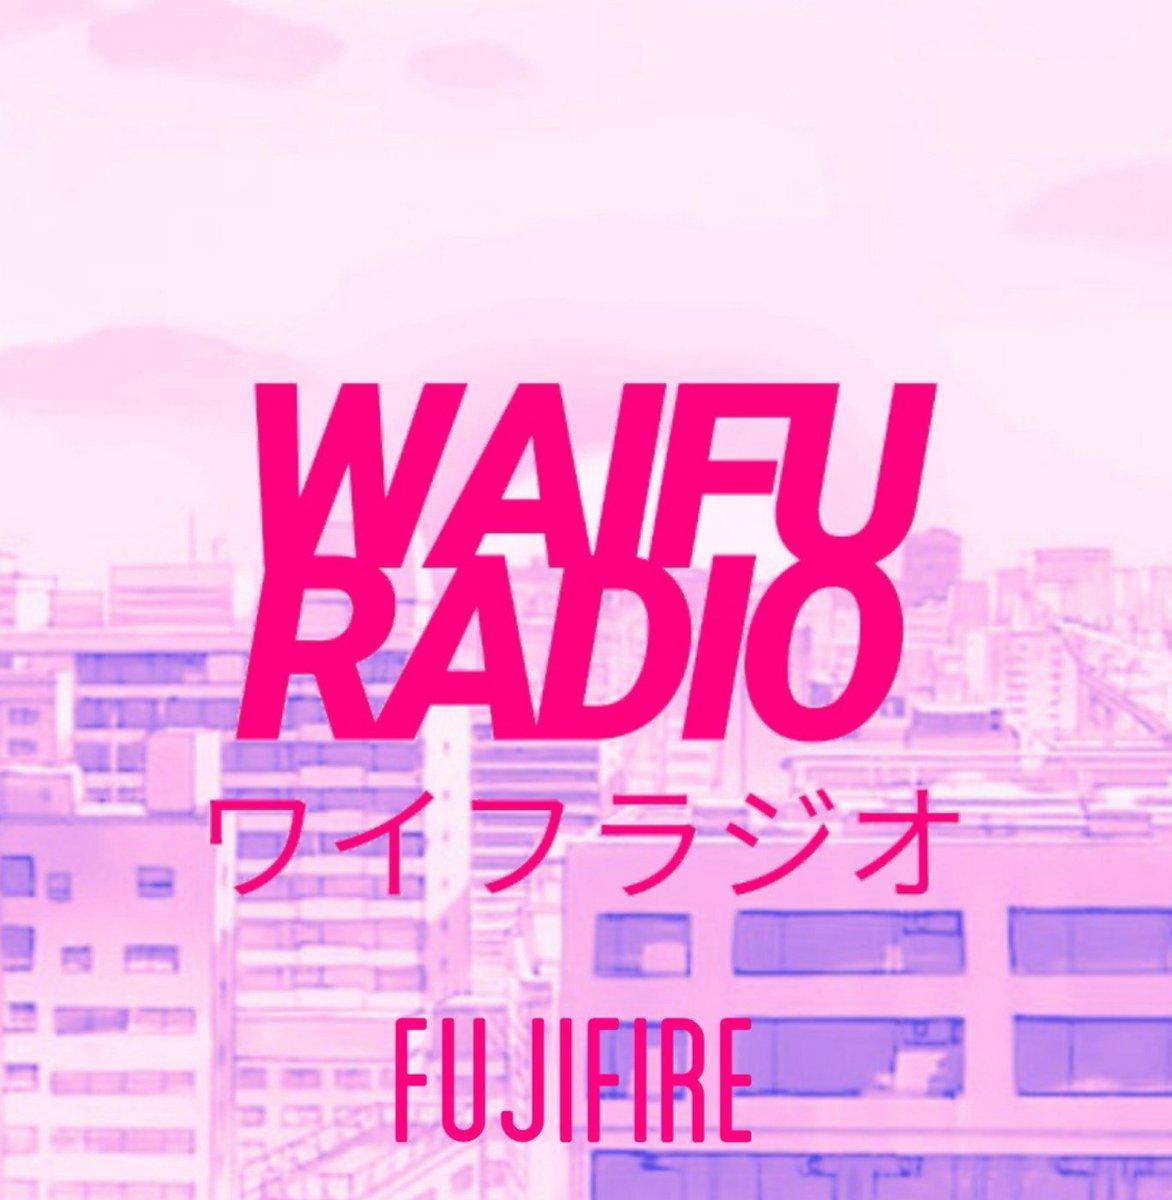 Fujifire Di Twitter Upcoming Album Waifu Radio Will Be Released On June 20th On Soundcloud And Bandcamp Coming Soon On Cassette Futurefunk Vaporwave Kawaii Anime Waifu Aesthetic Japan Funk